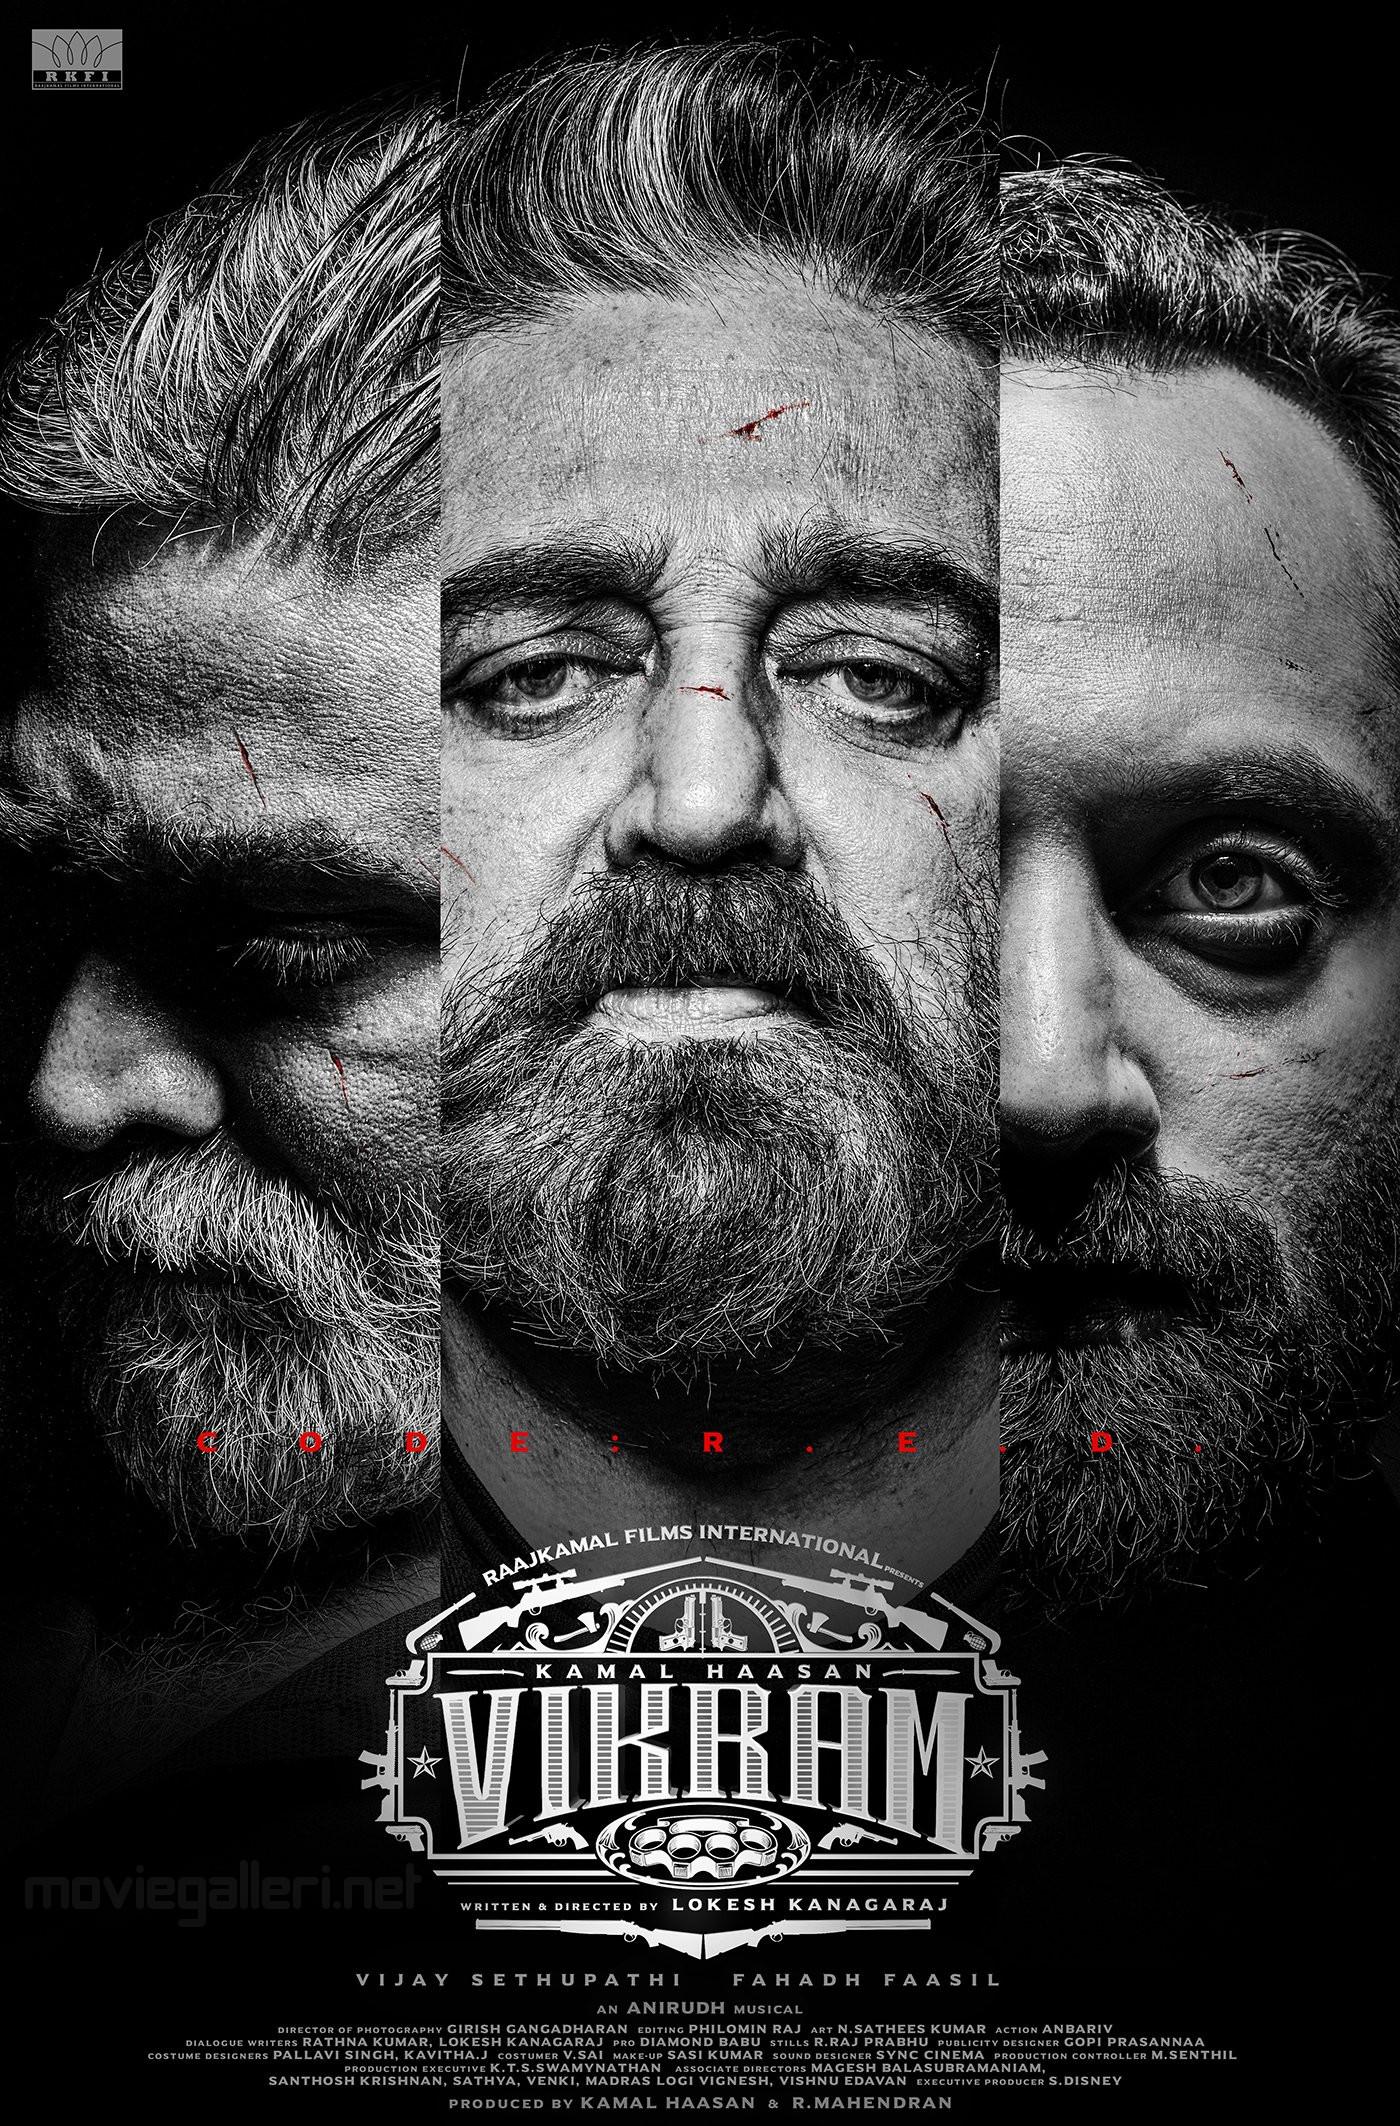 Vijay Sethupathi Kamal Haasan Fahadh Faasil Vikram Movie First Look Poster HD